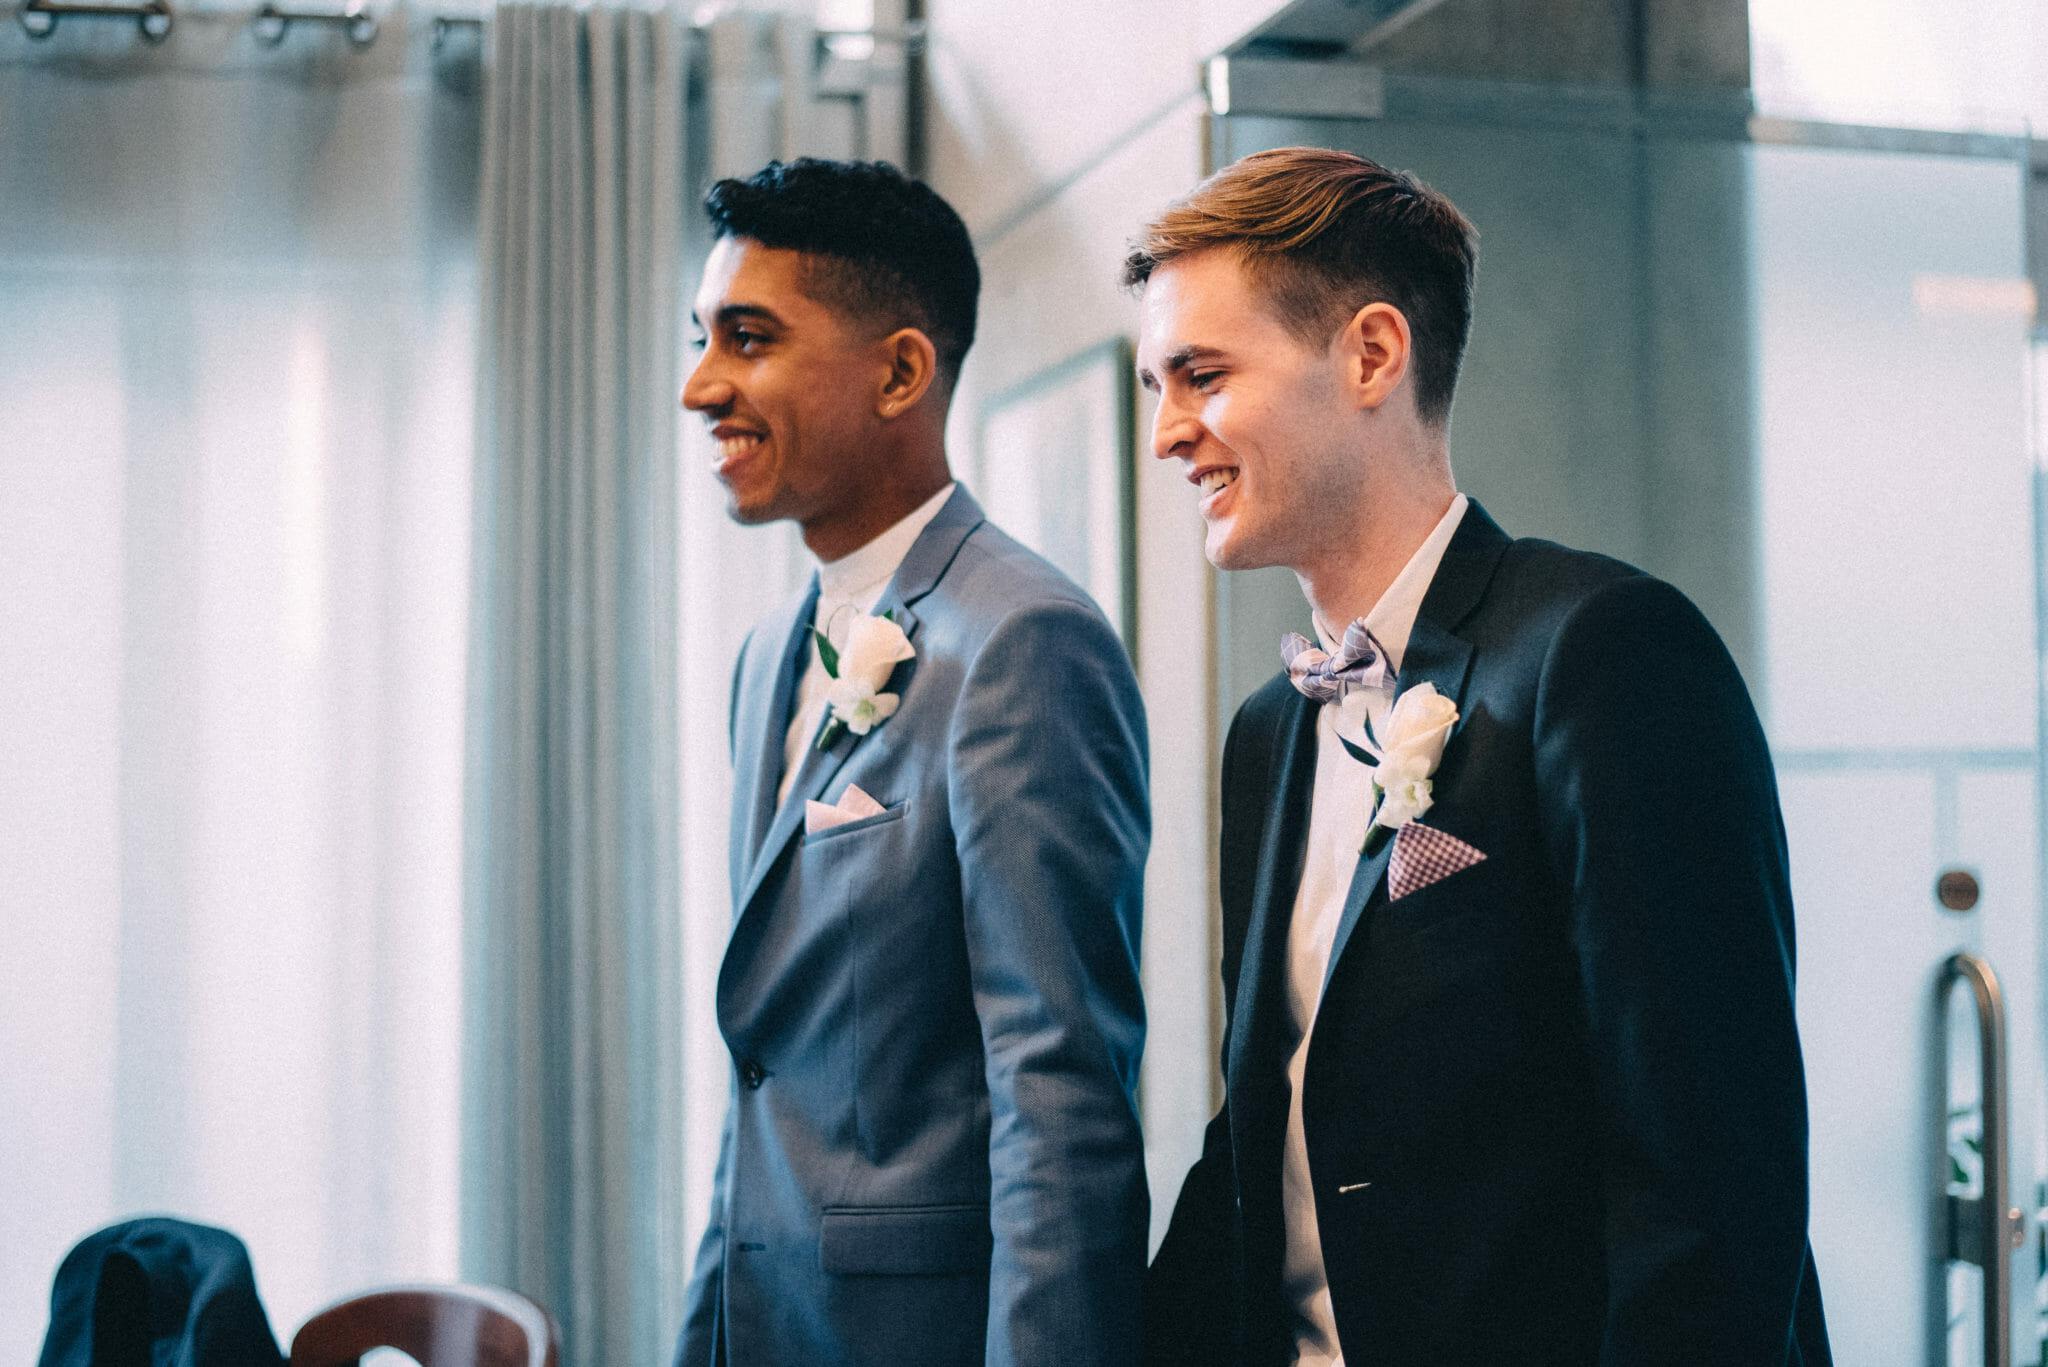 gay wedding ceremony at toronto city hall